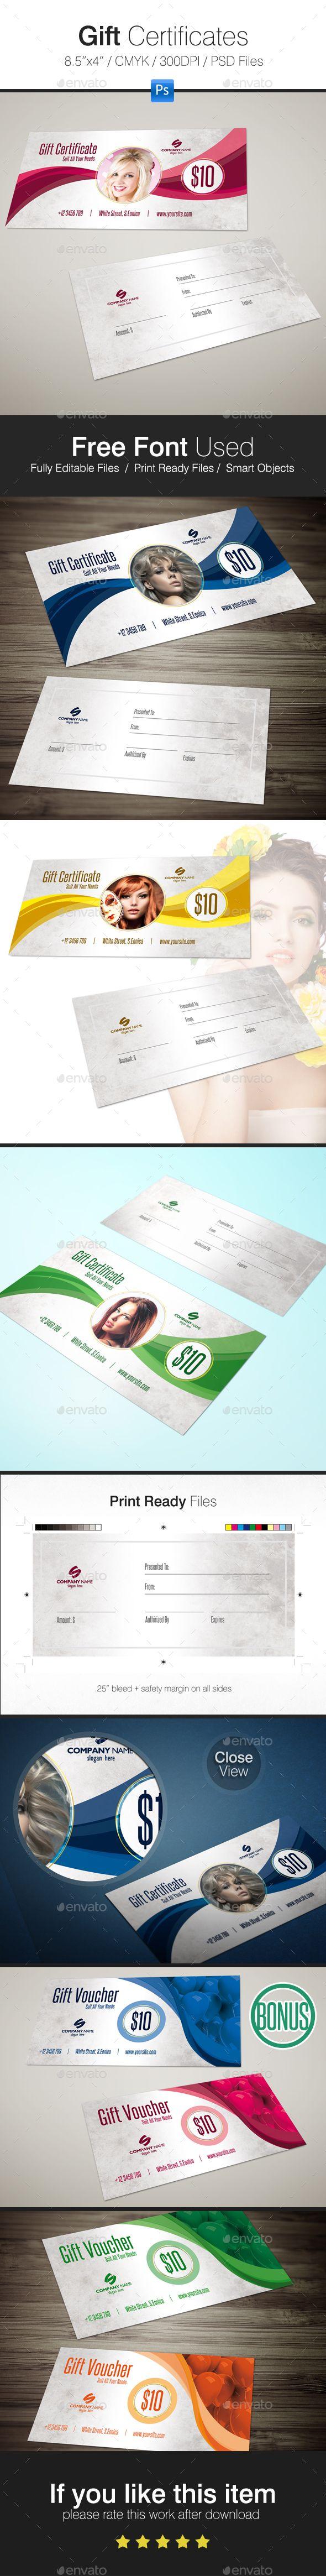 Gift Certificates + BONUS - Cards & Invites Print Templates Download: https://graphicriver.net/item/gift-voucher/19171392